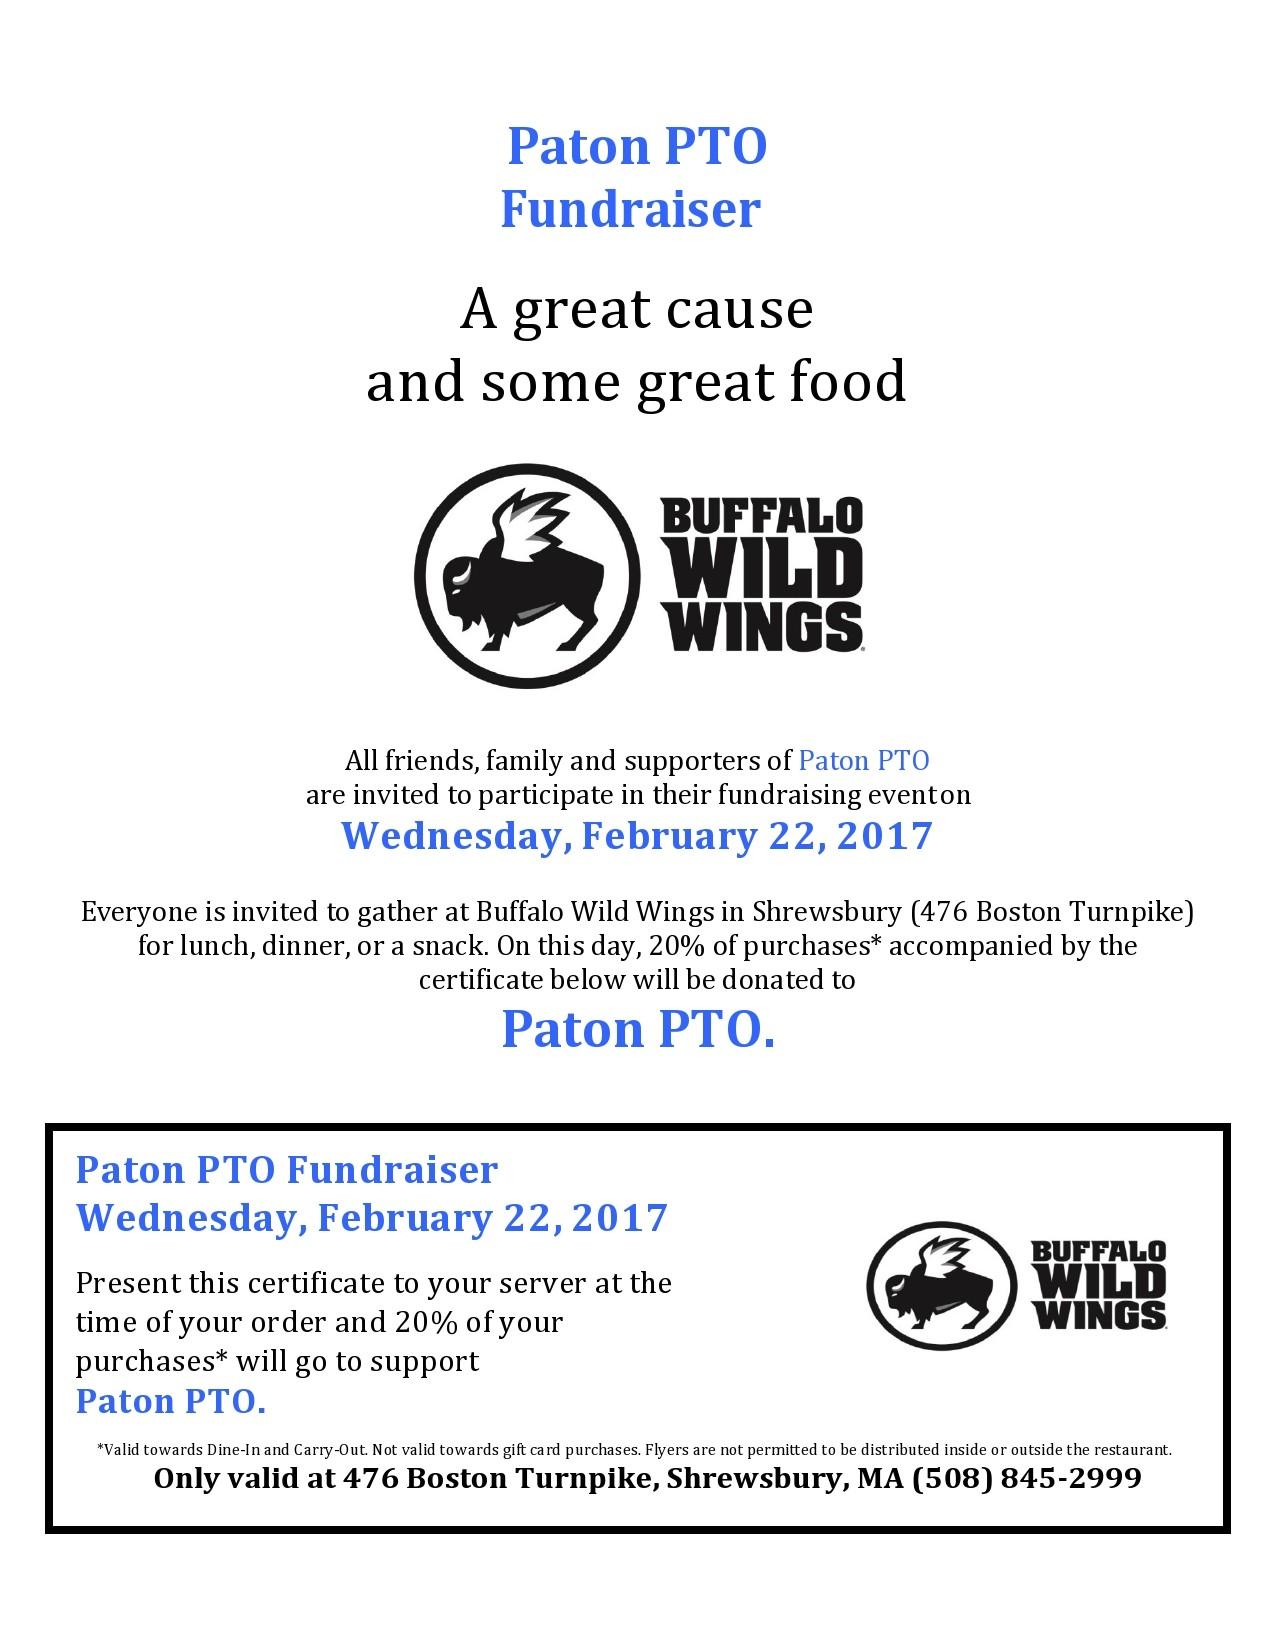 Free fundraiser flyer 14